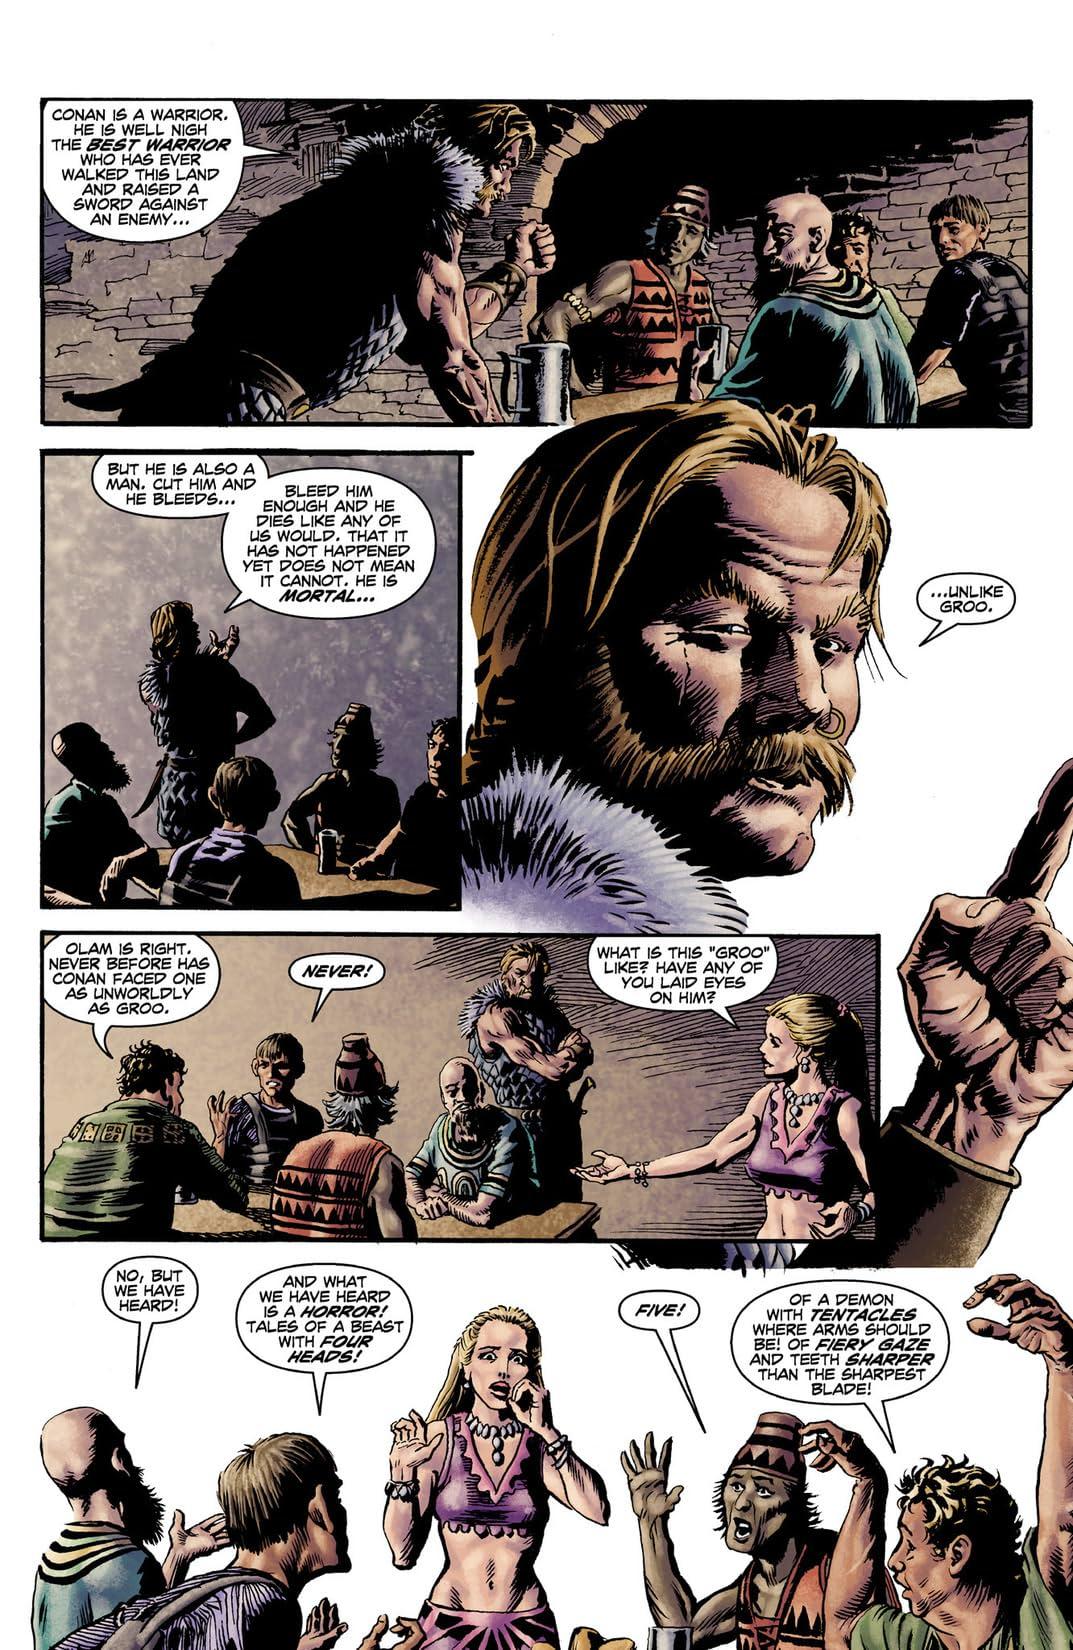 Groo vs. Conan #3